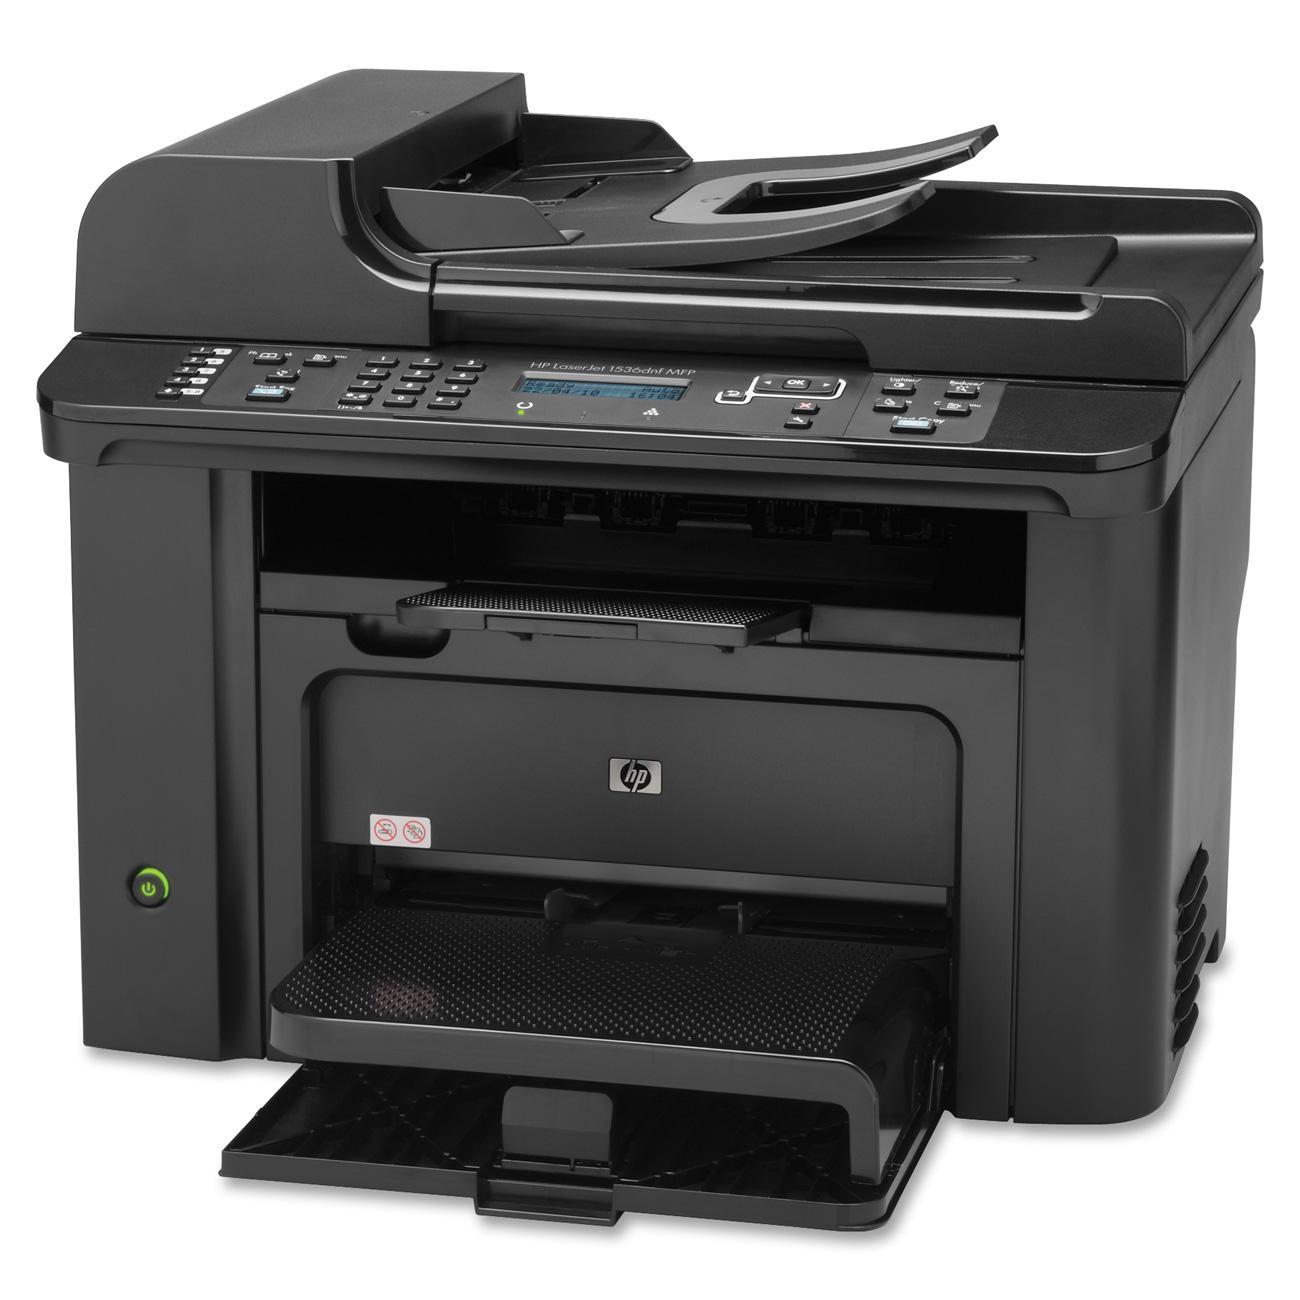 Принтер HP LaserJet Pro M1536dnf Multifunction Printer